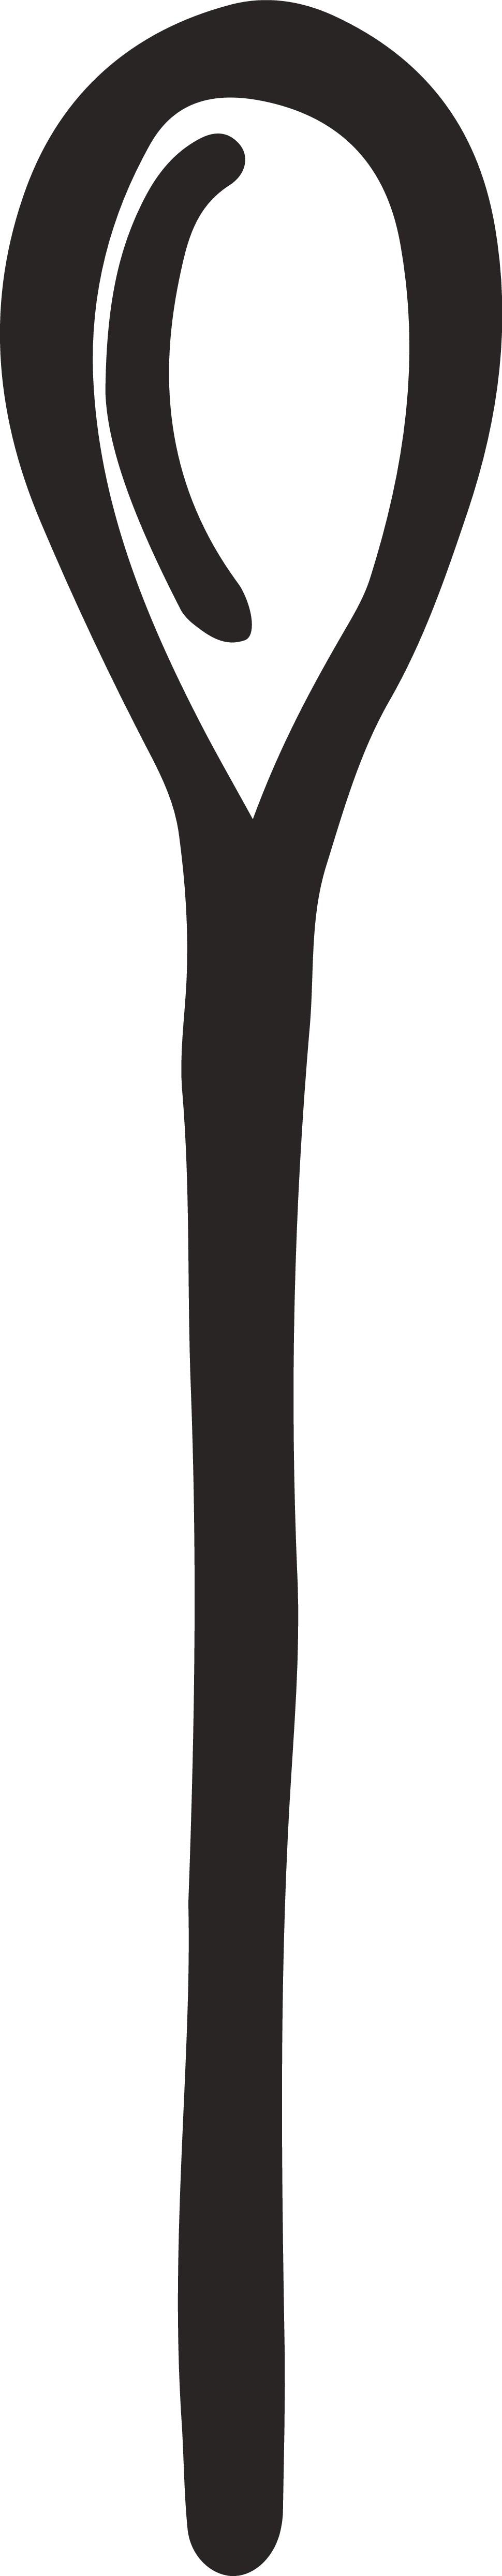 Hand Drawn Spoon Ilustration